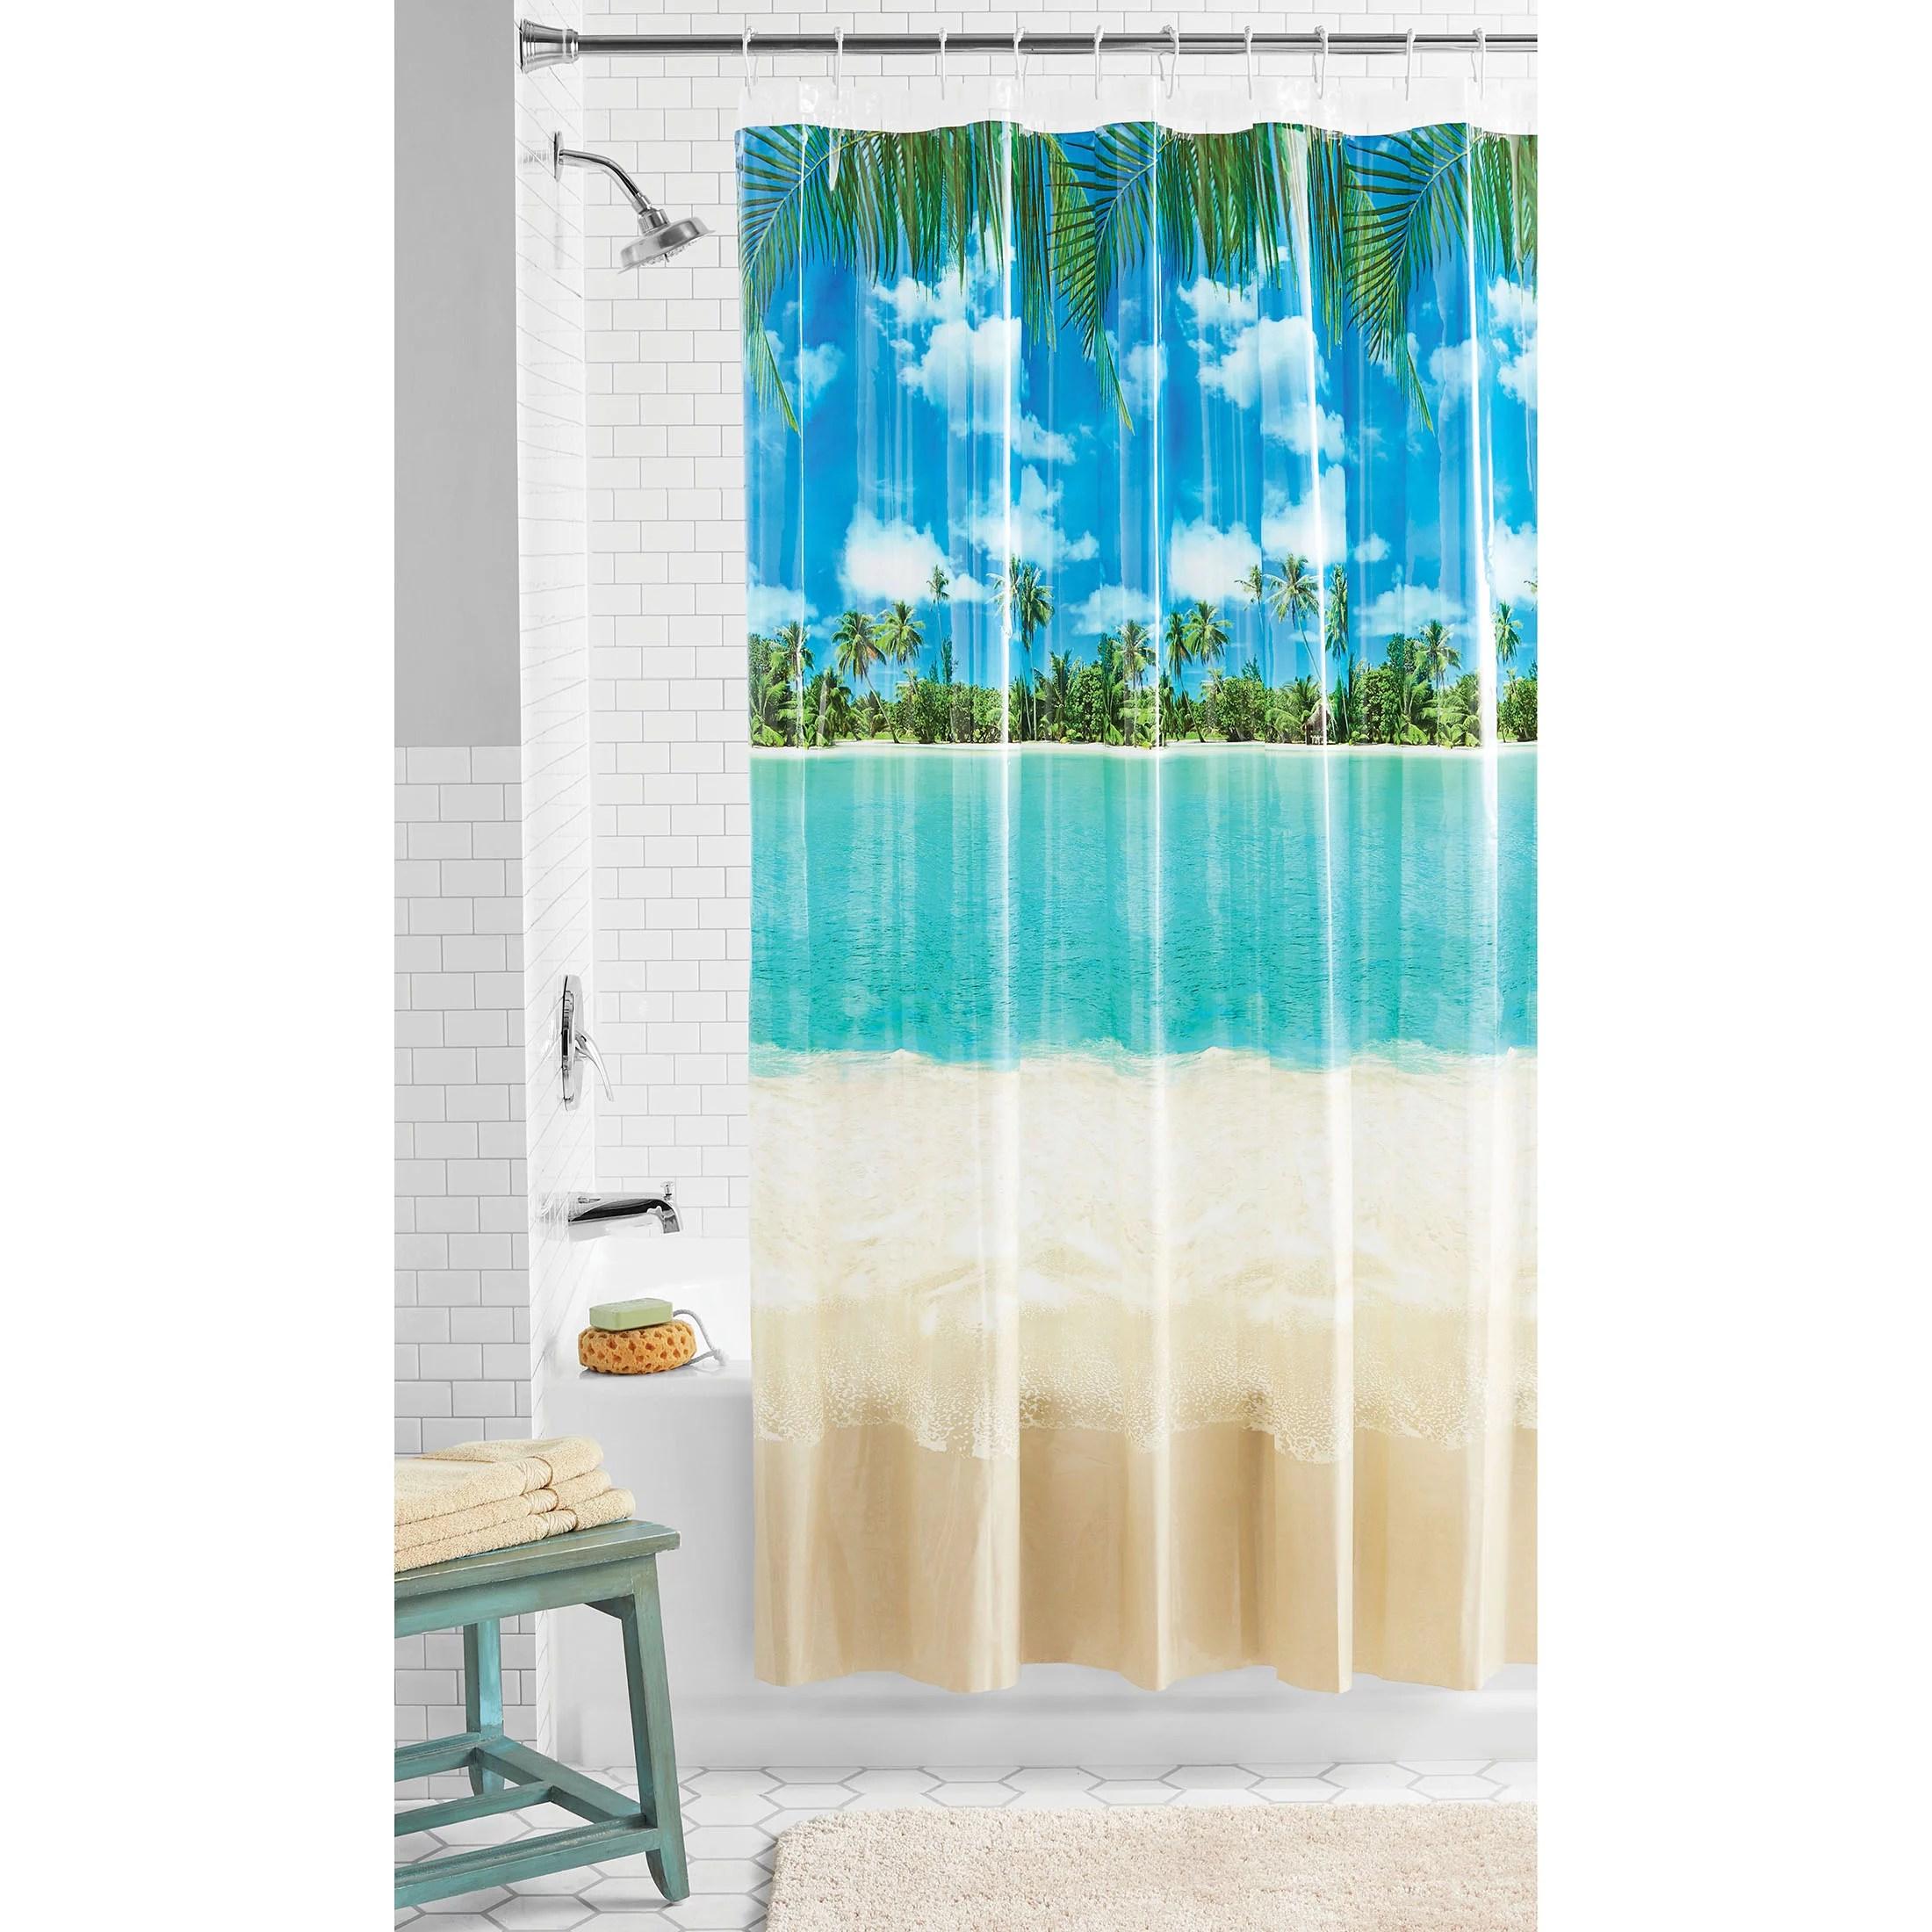 mainstays photoreal beach chloride free peva printed scenic shower curtain multi 70 x 71 walmart com